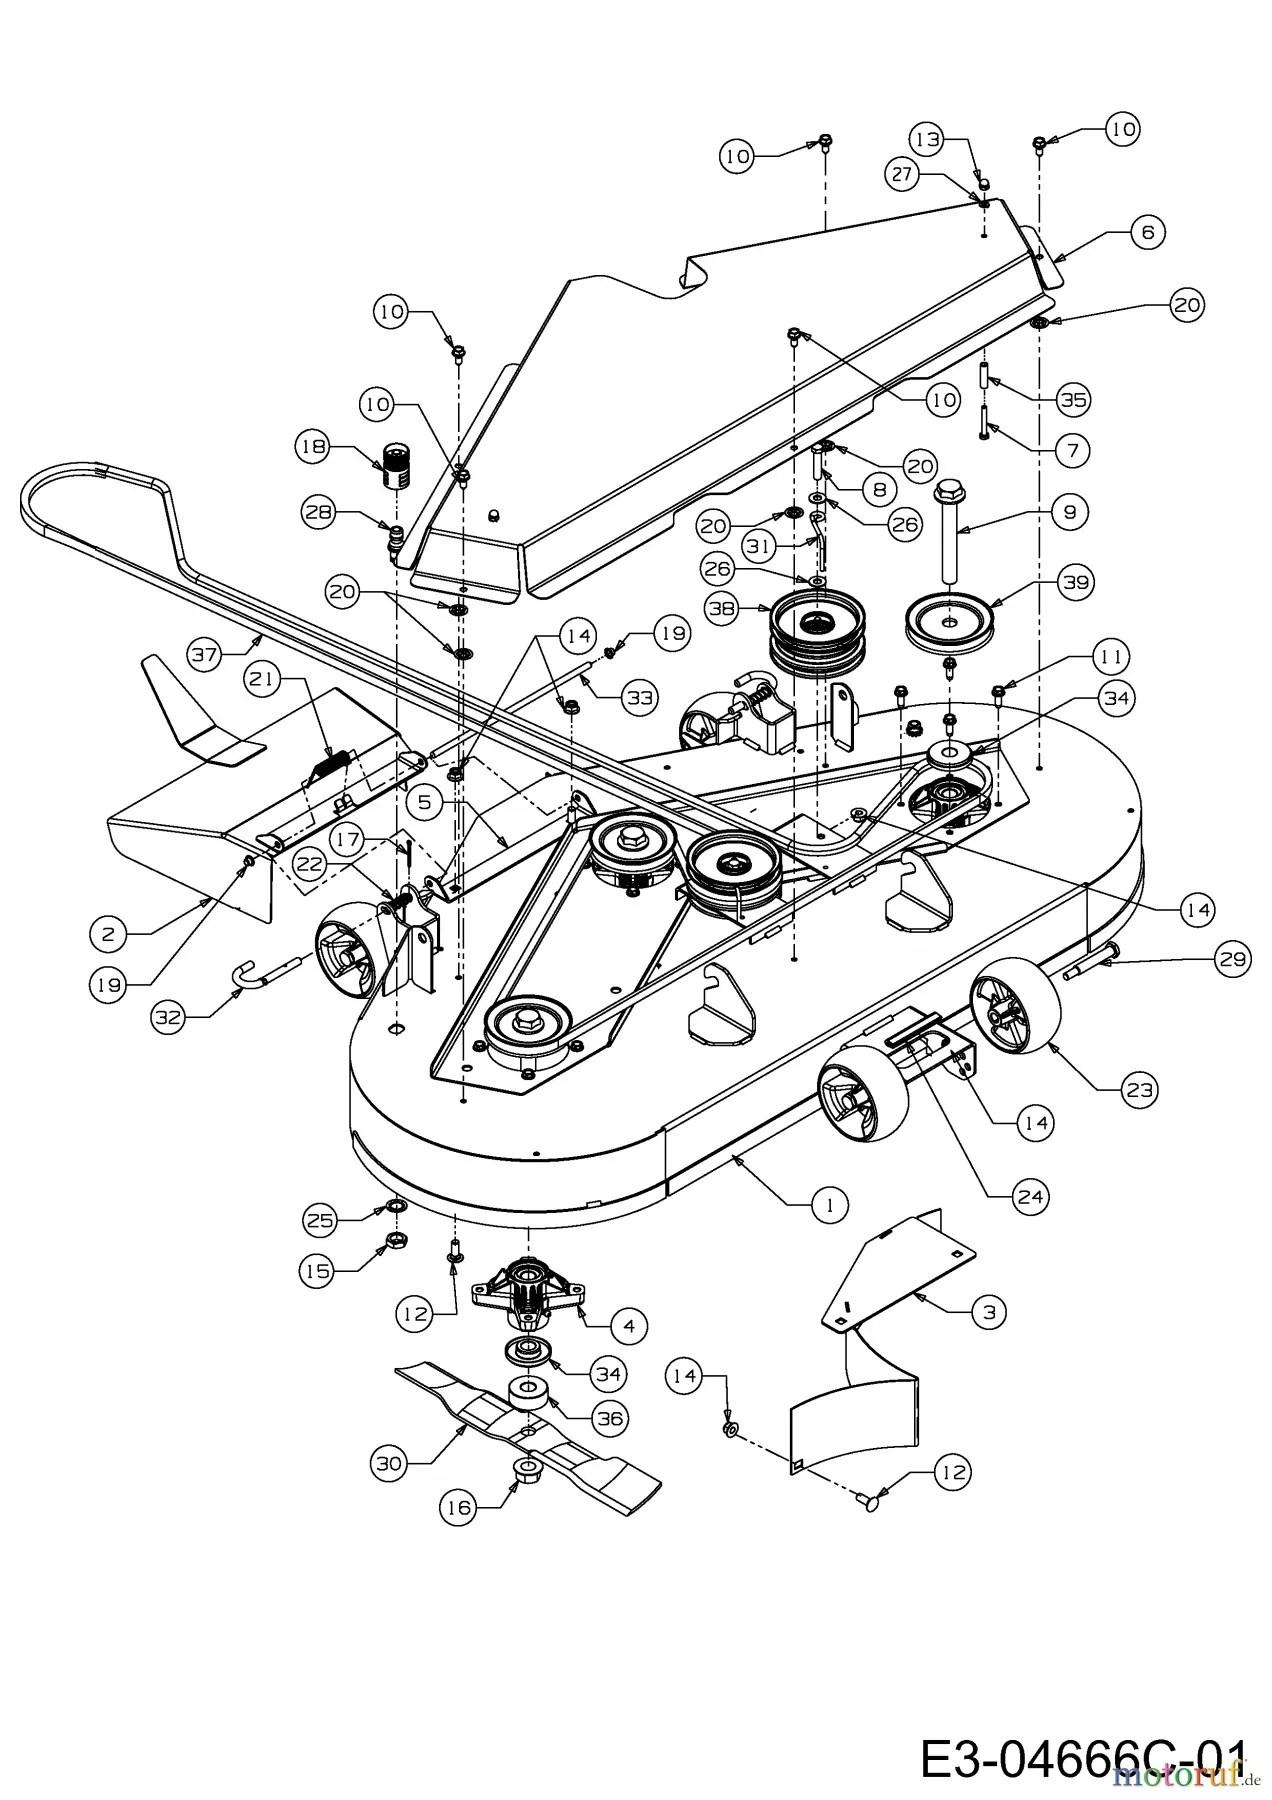 hight resolution of cub cadet zero turn parts diagram cub cadet zero turn fmz 48 17bi4bfy603 2011 mowing deck